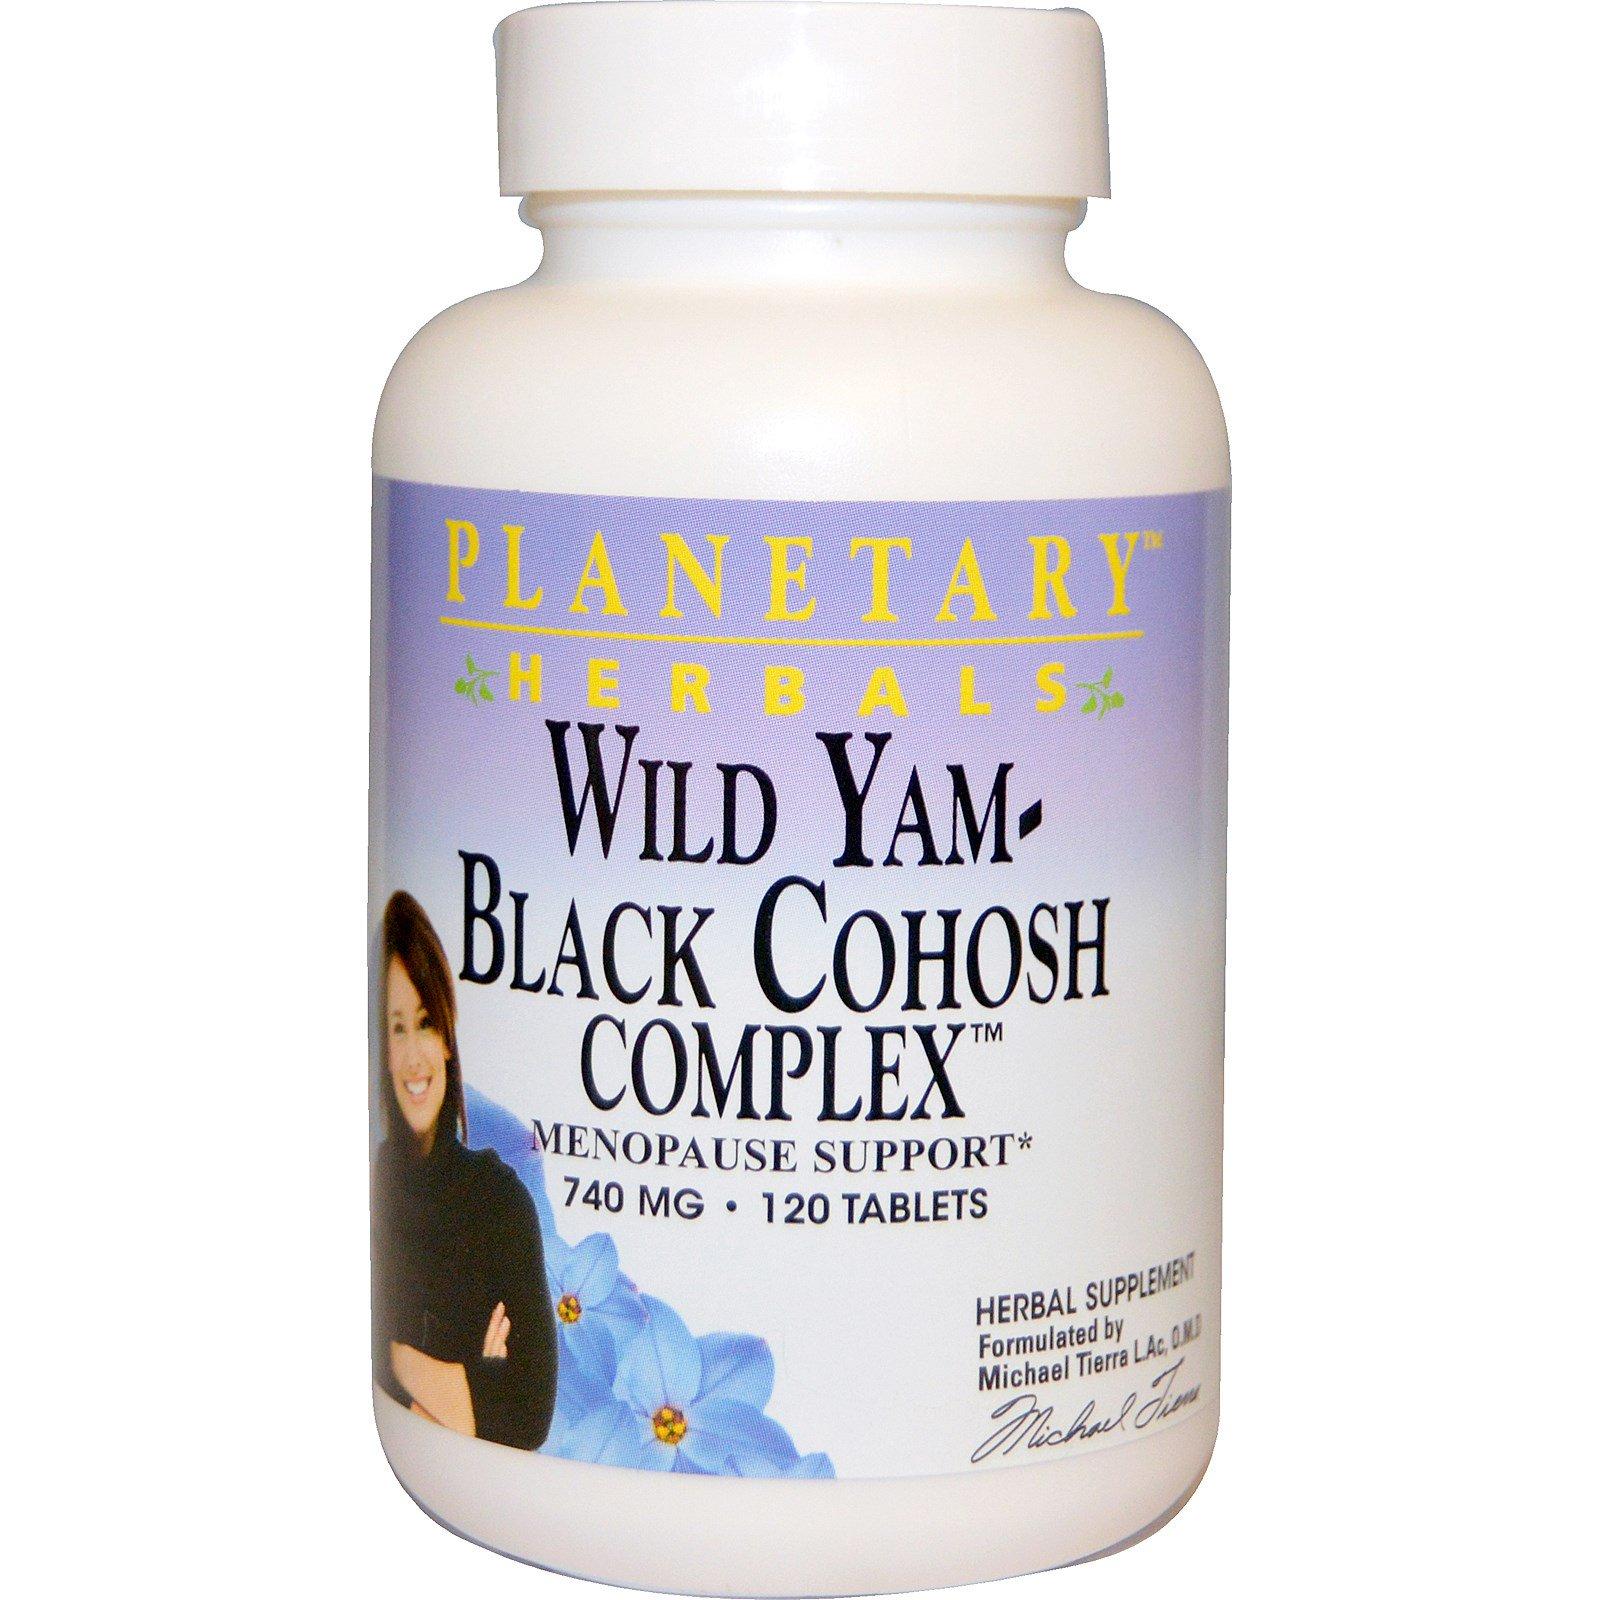 Planetary Herbals, Wild Yam - Black Cohosh Complex, 740 mg